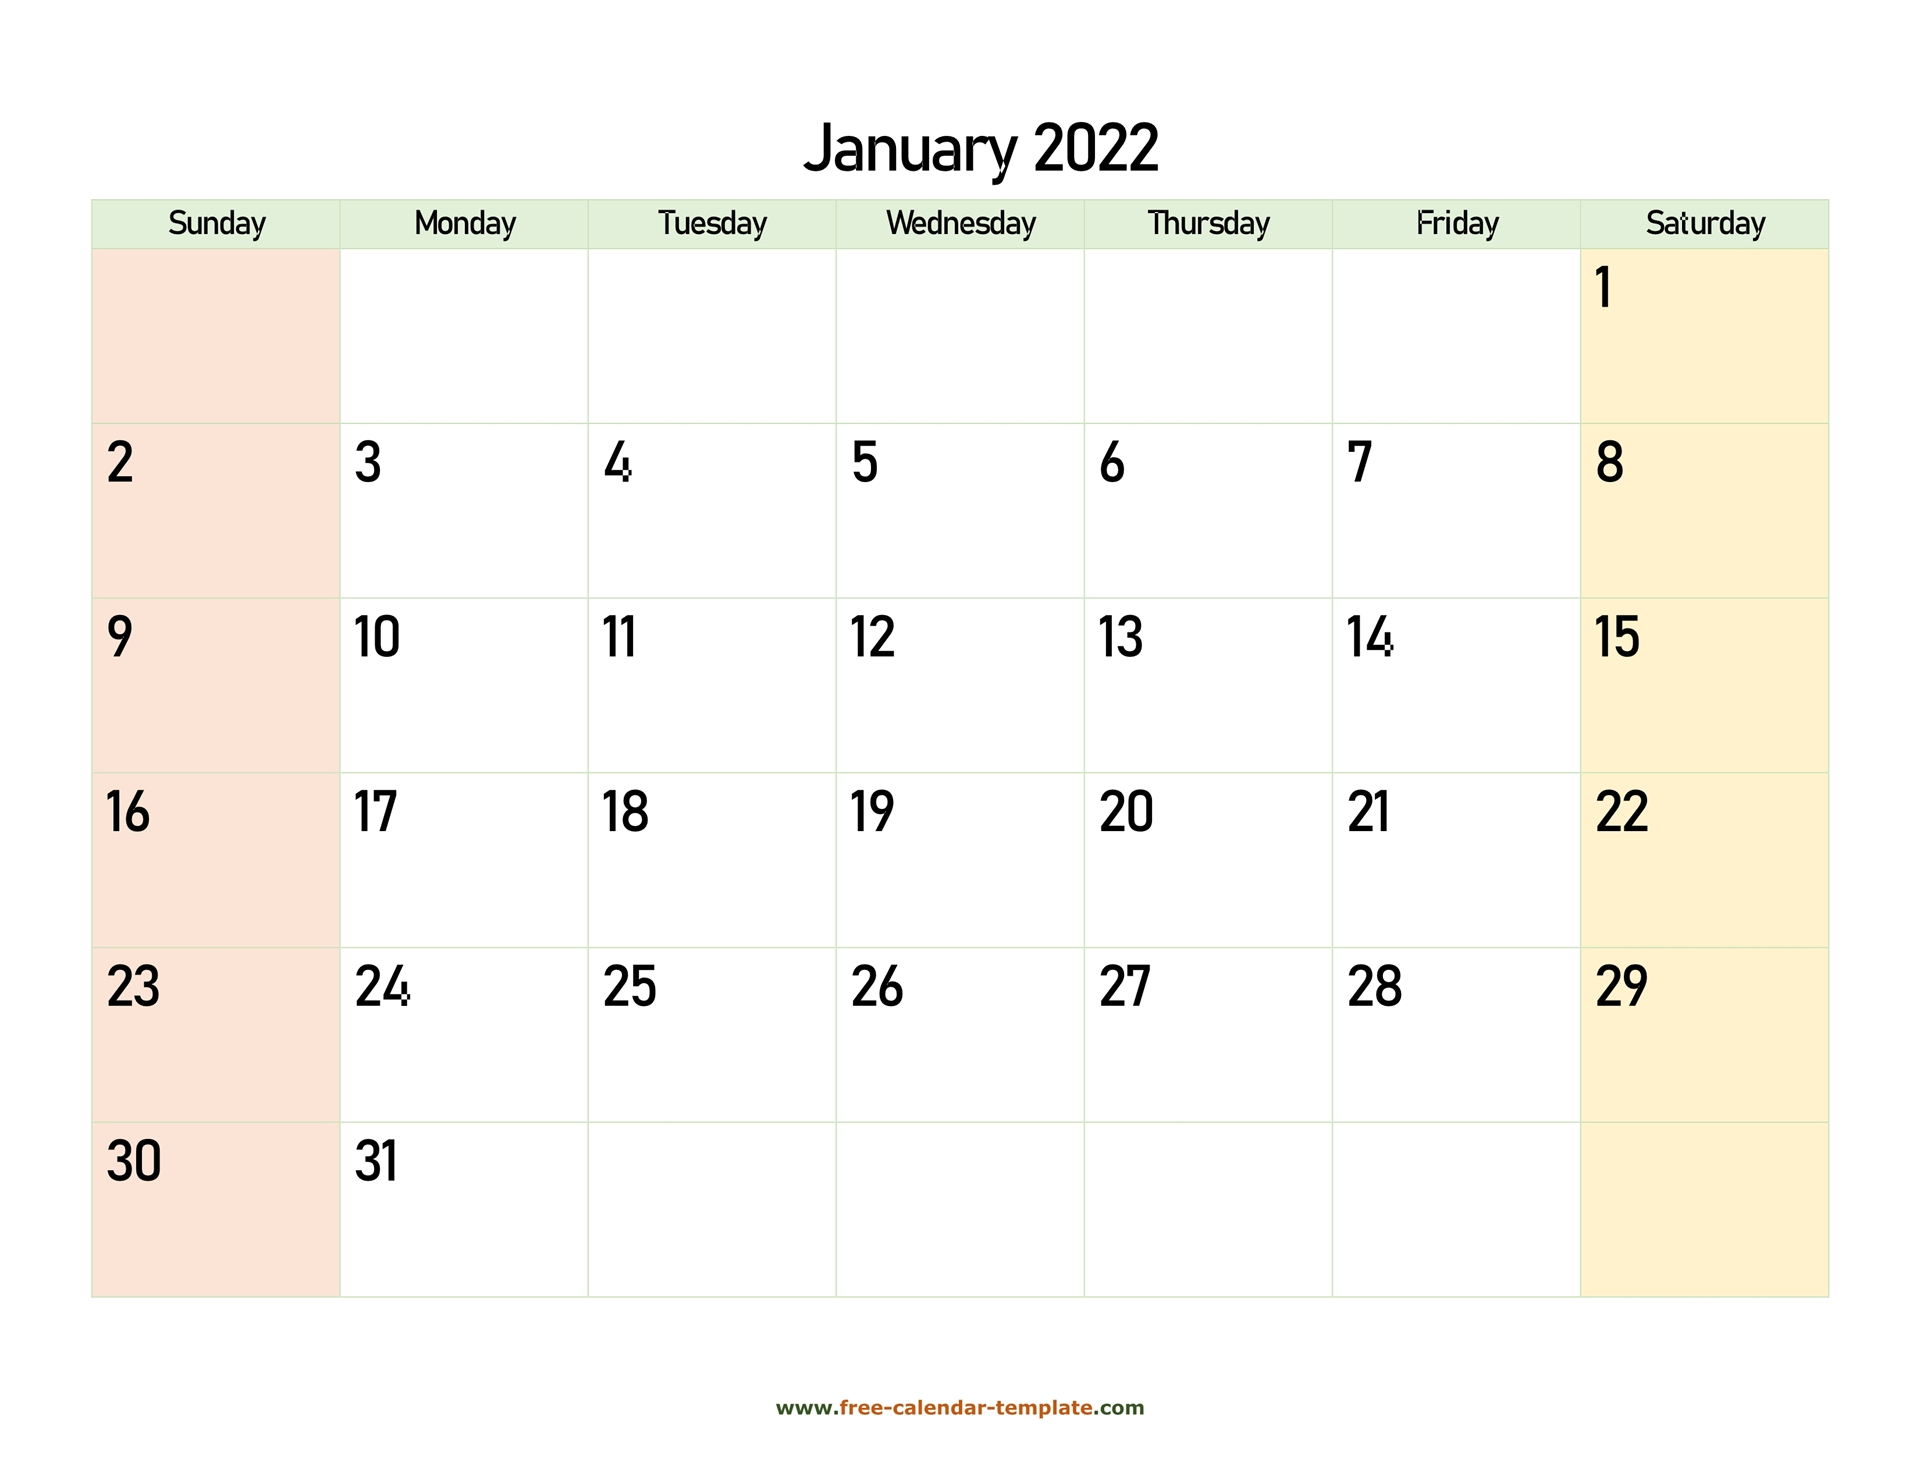 January 2022 Free Calendar Tempplate | Free-Calendar-Template with regard to Landscape Calendar January 2022